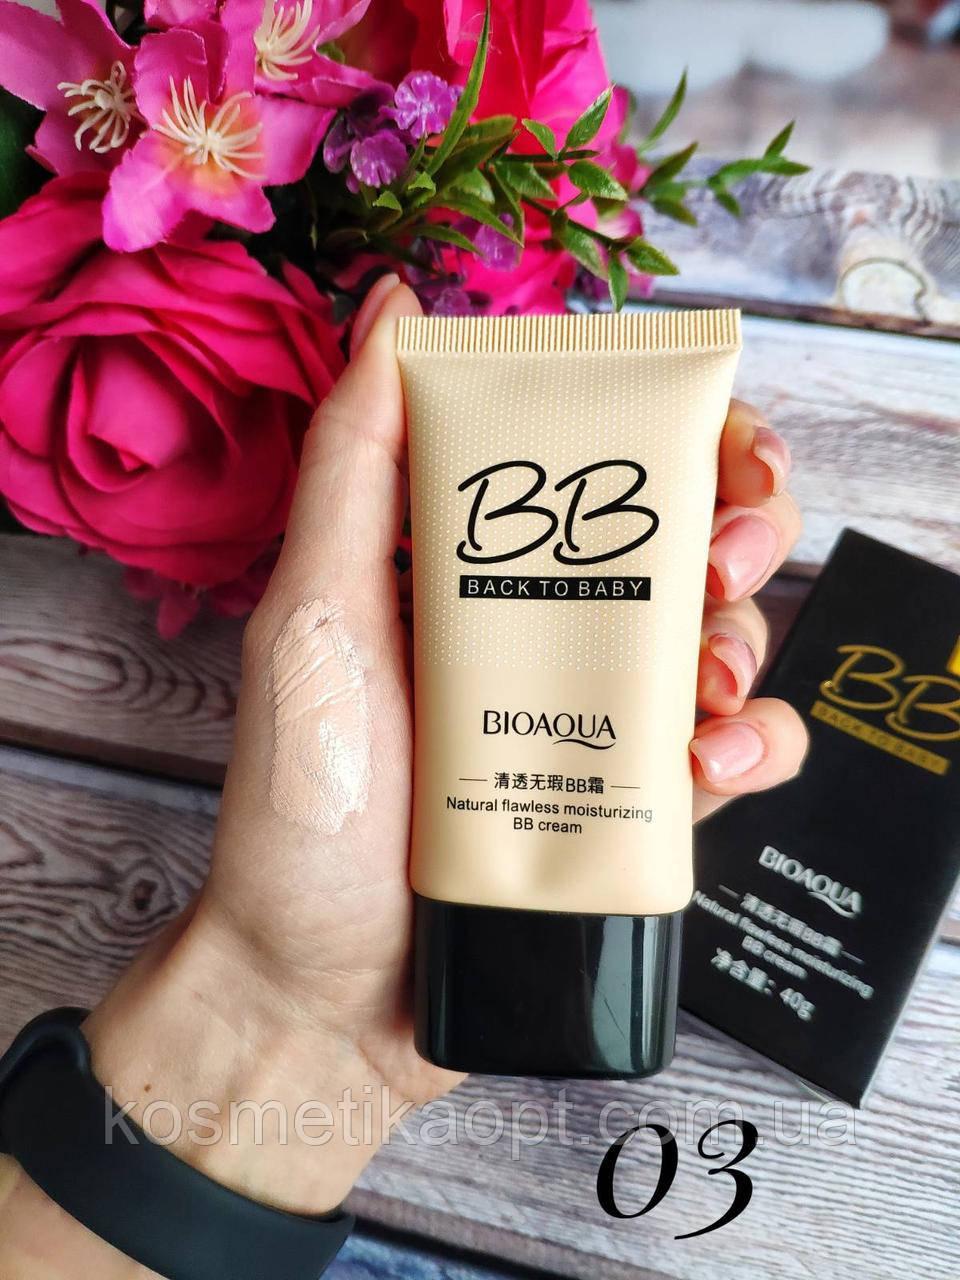 BioAqua Back to Baby BB Cream Увлажняющий BB крем, 40 грамм ТОН 03  Натуральный беж